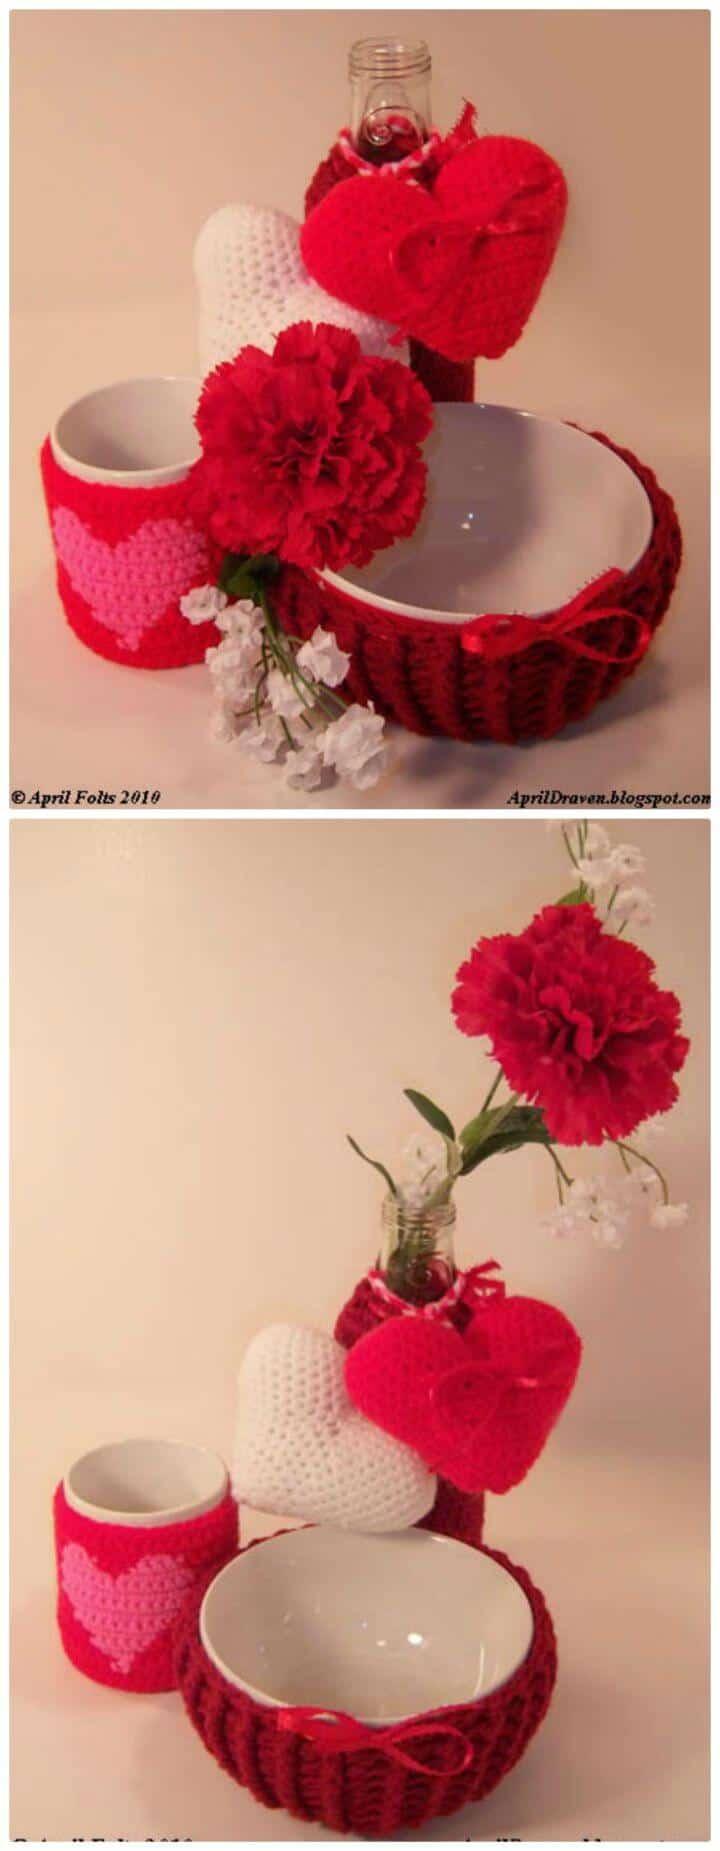 Free Crochet Valentine's Day Project Pattern